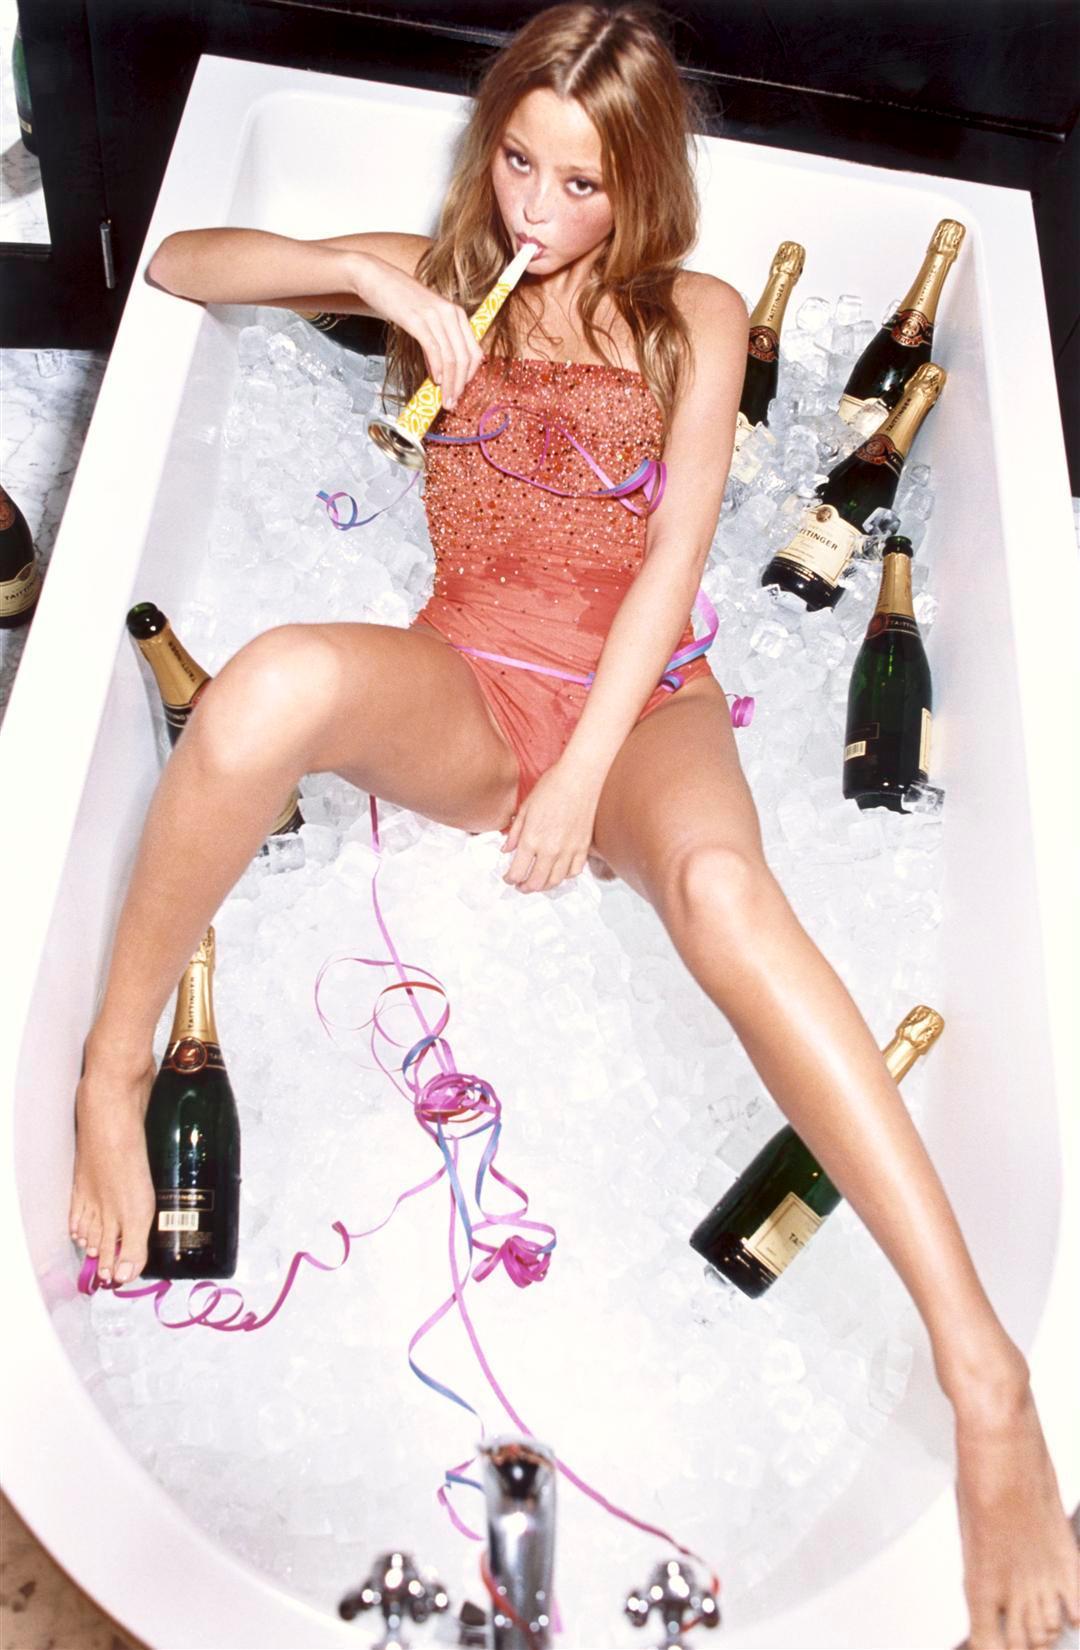 Champagne Lady Escort